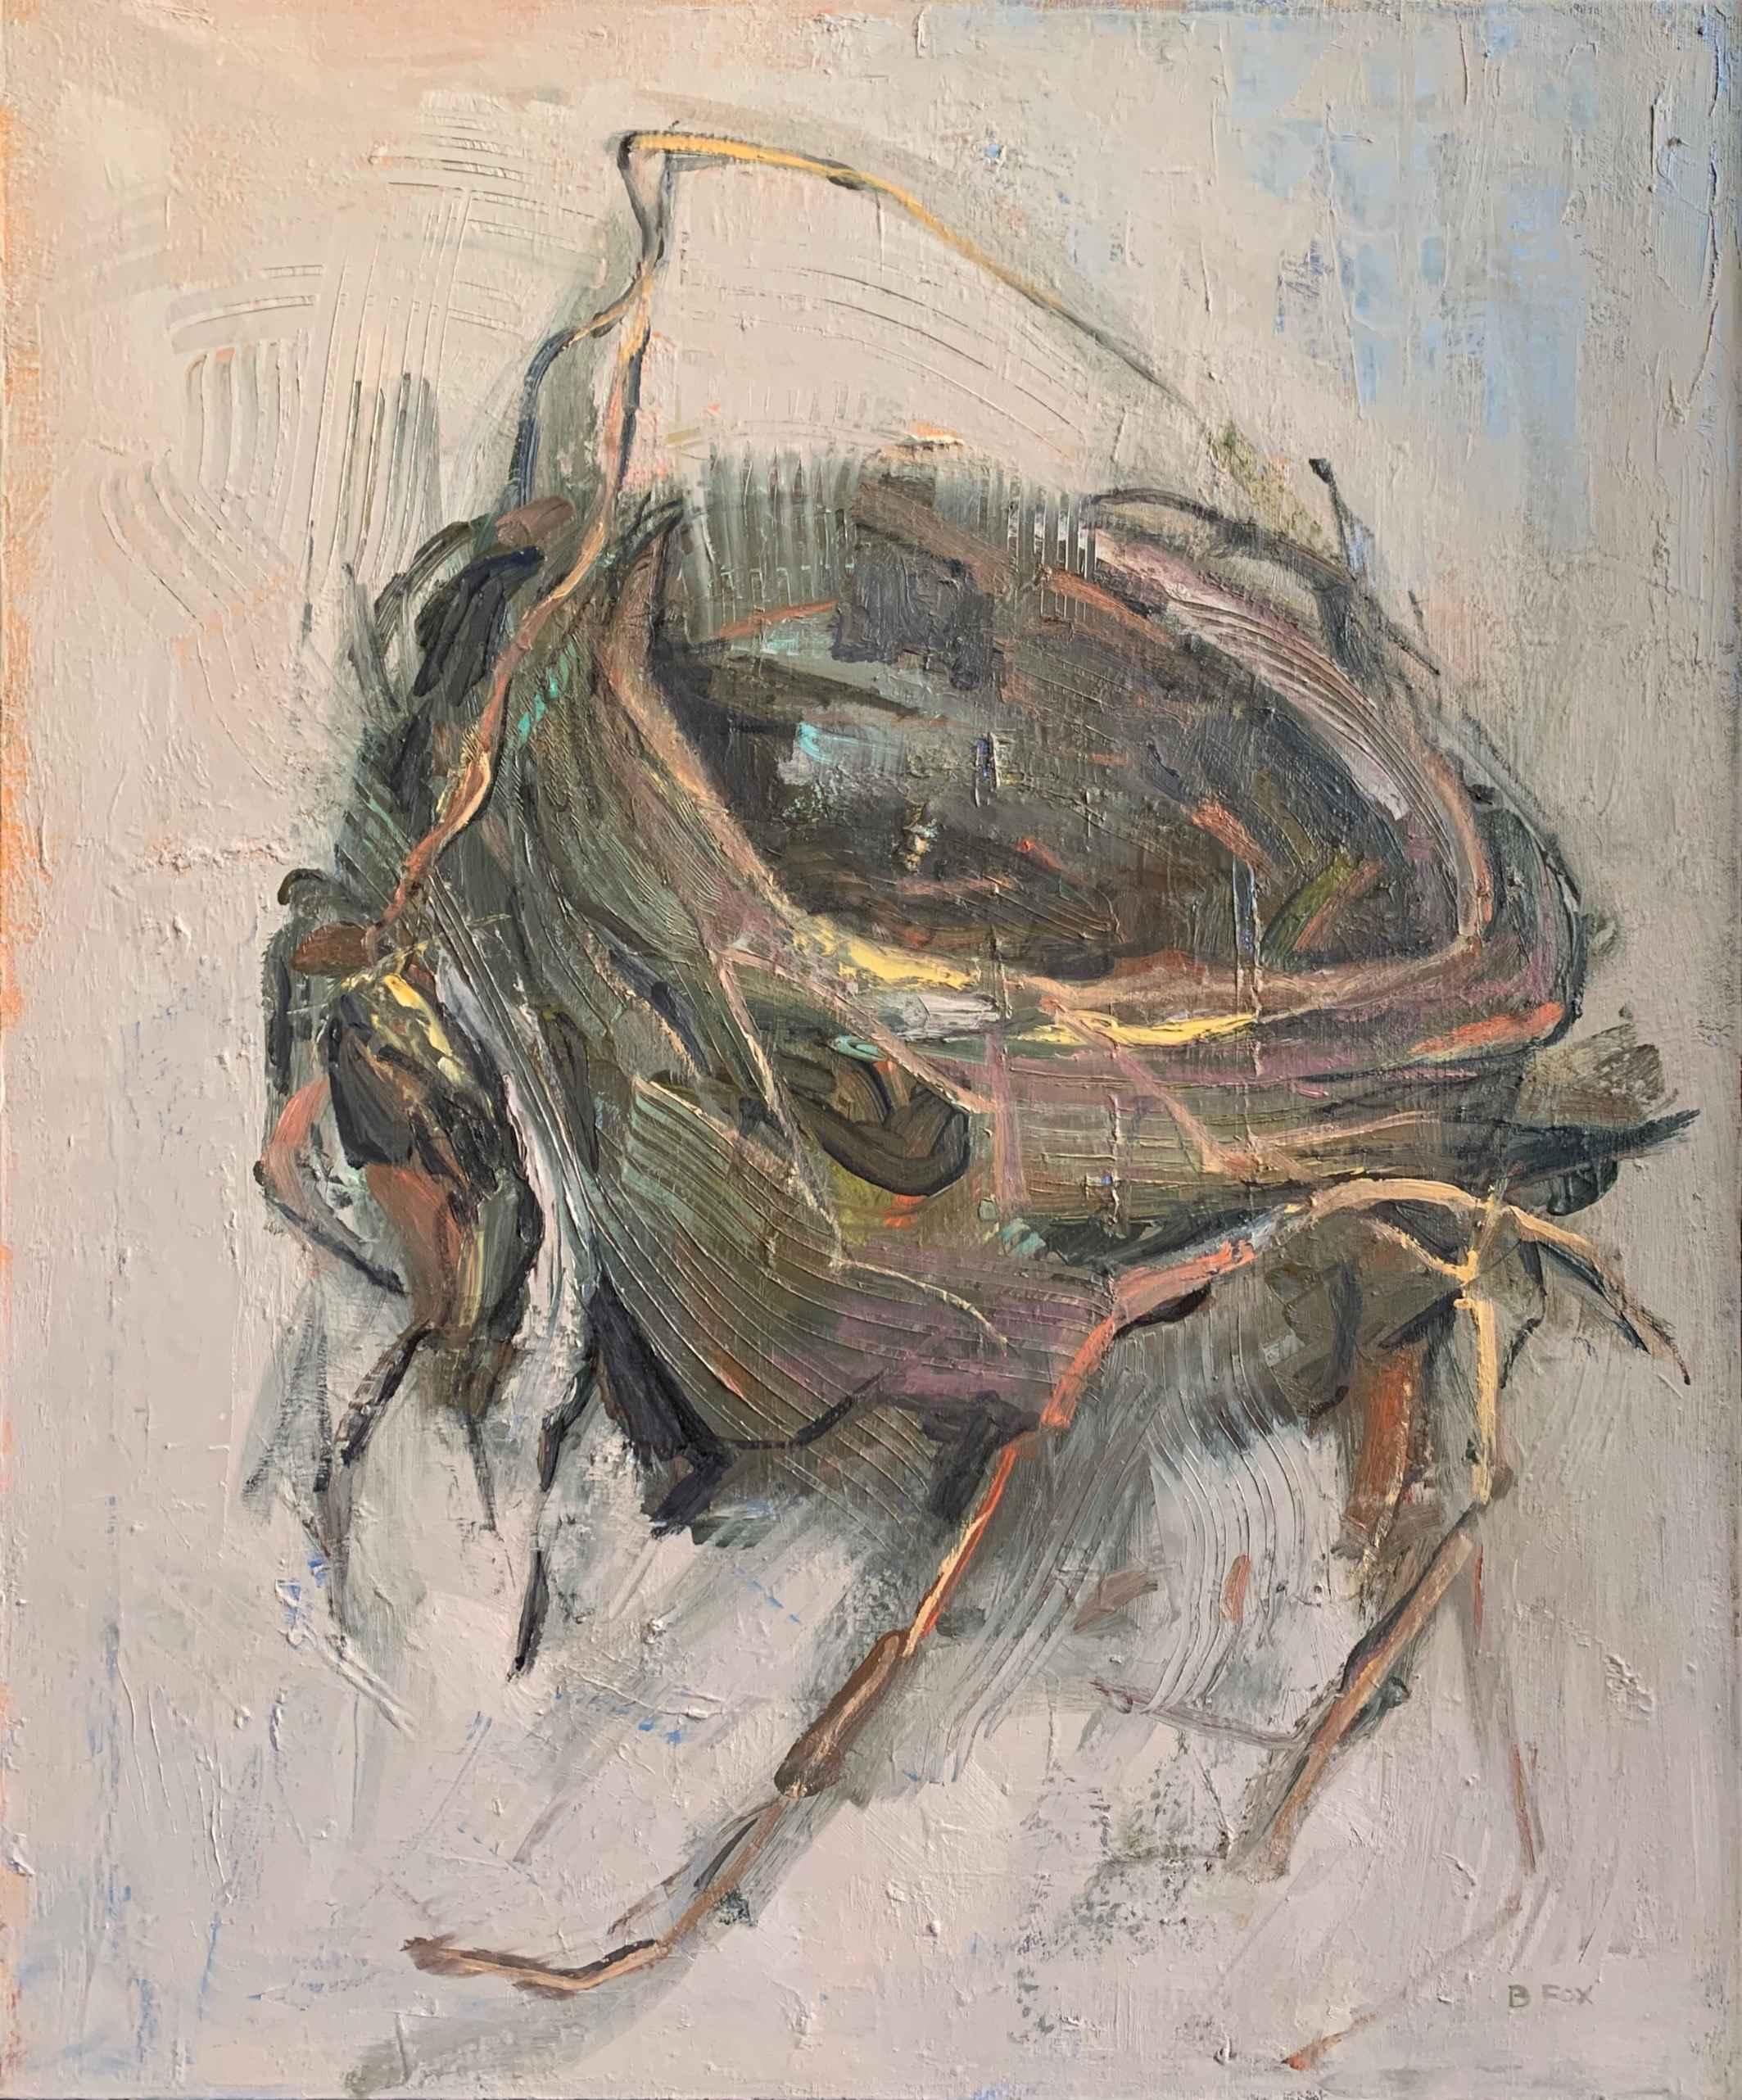 Empty Nest by  Brenda Fox - Masterpiece Online